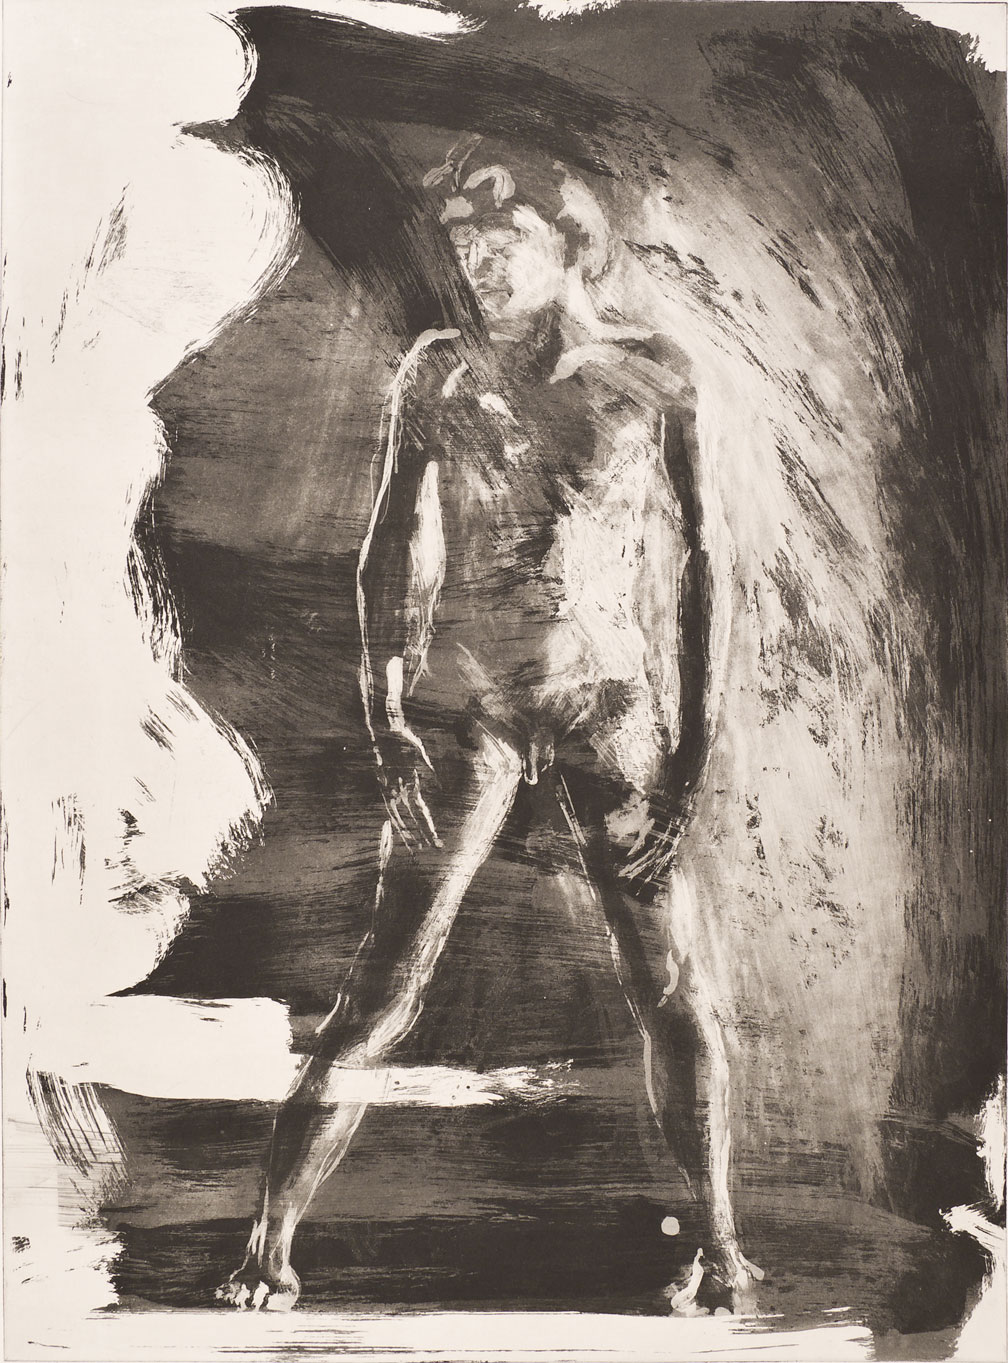 Floating Islands George Platt Lynes Figure, 1985. Etching on paper, study proof J, 30 x 21 inches